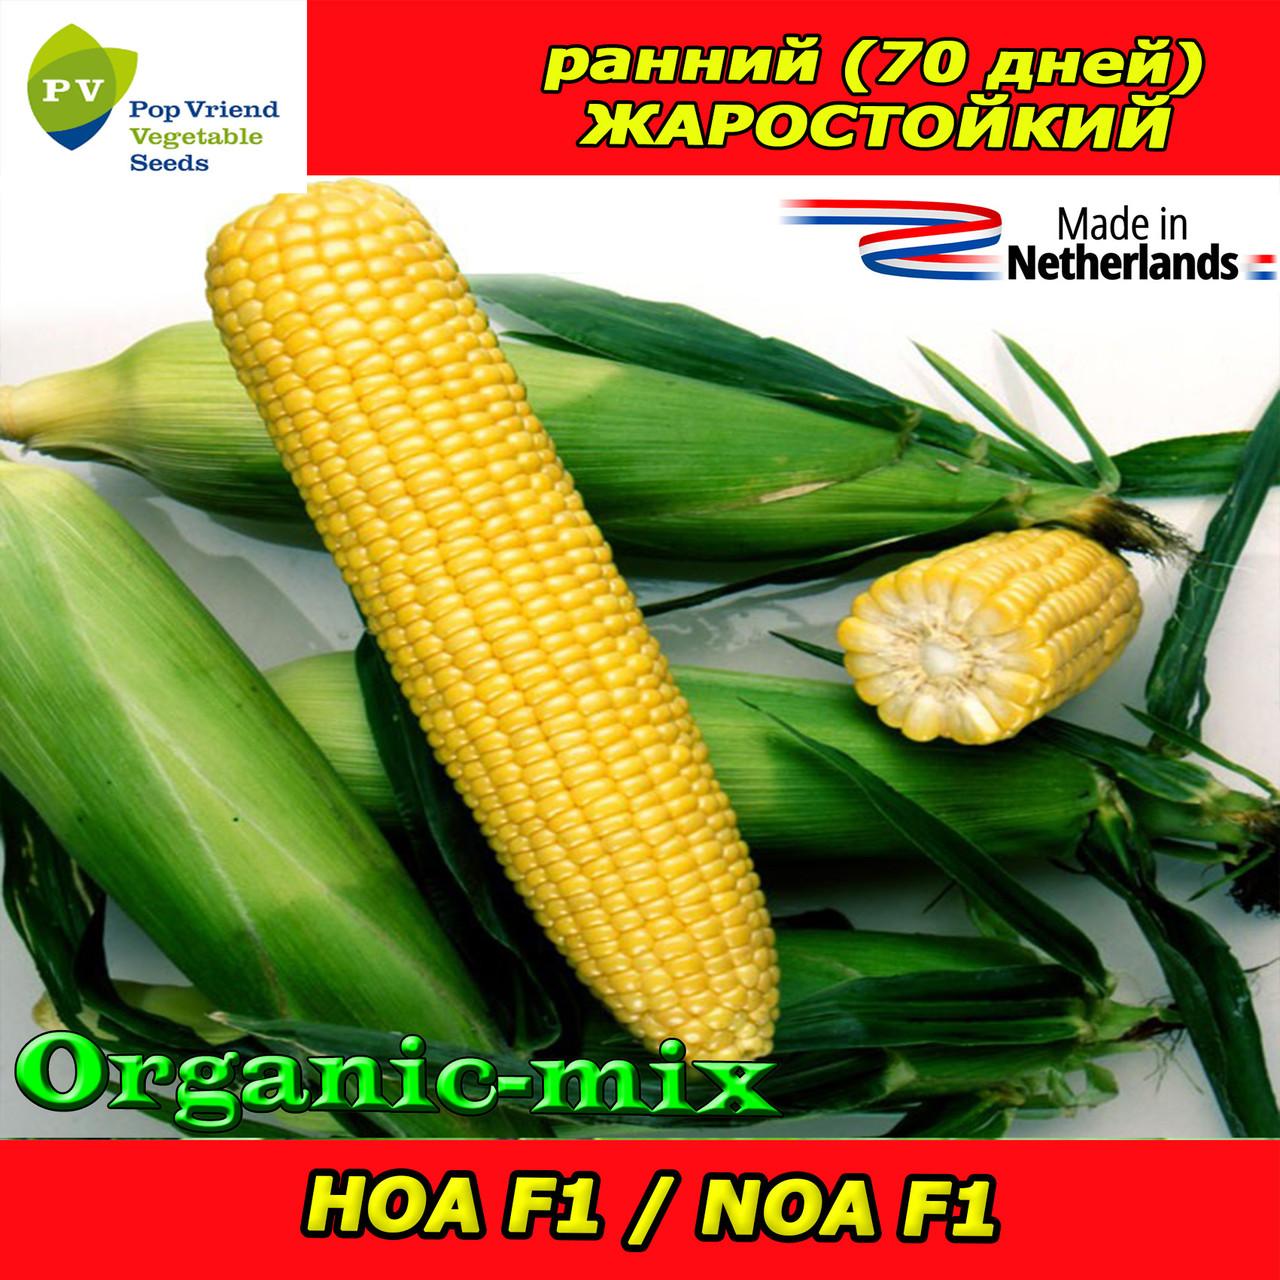 Семена, НОА F1 / NOA F1, сахарная кукуруза, 5 000 семян, ТМ Pop Vriend Seeds (Нидерланды)